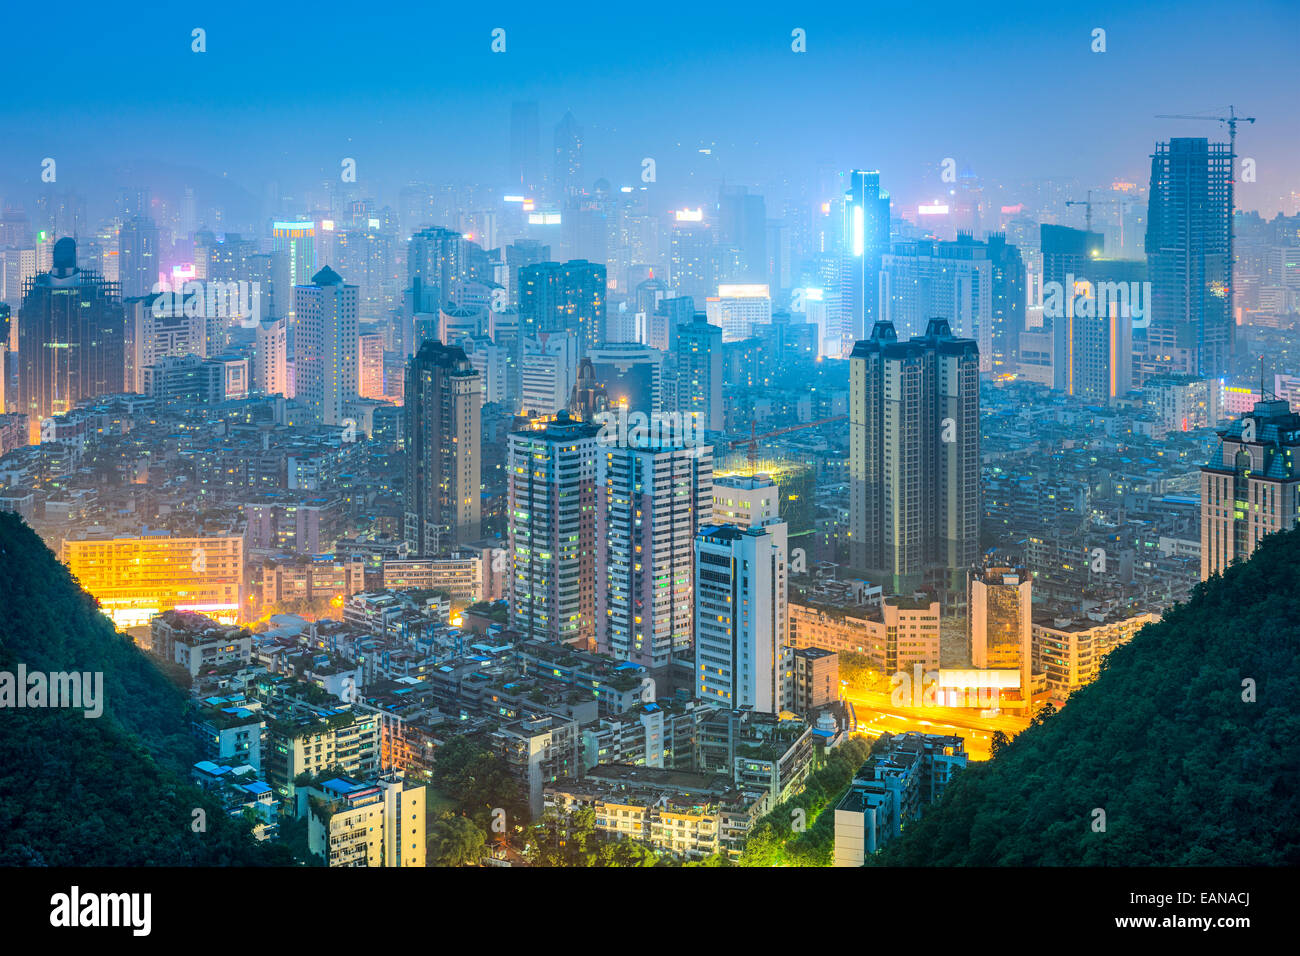 Guiyang, Guizhou, China downtown city skyline. - Stock Image